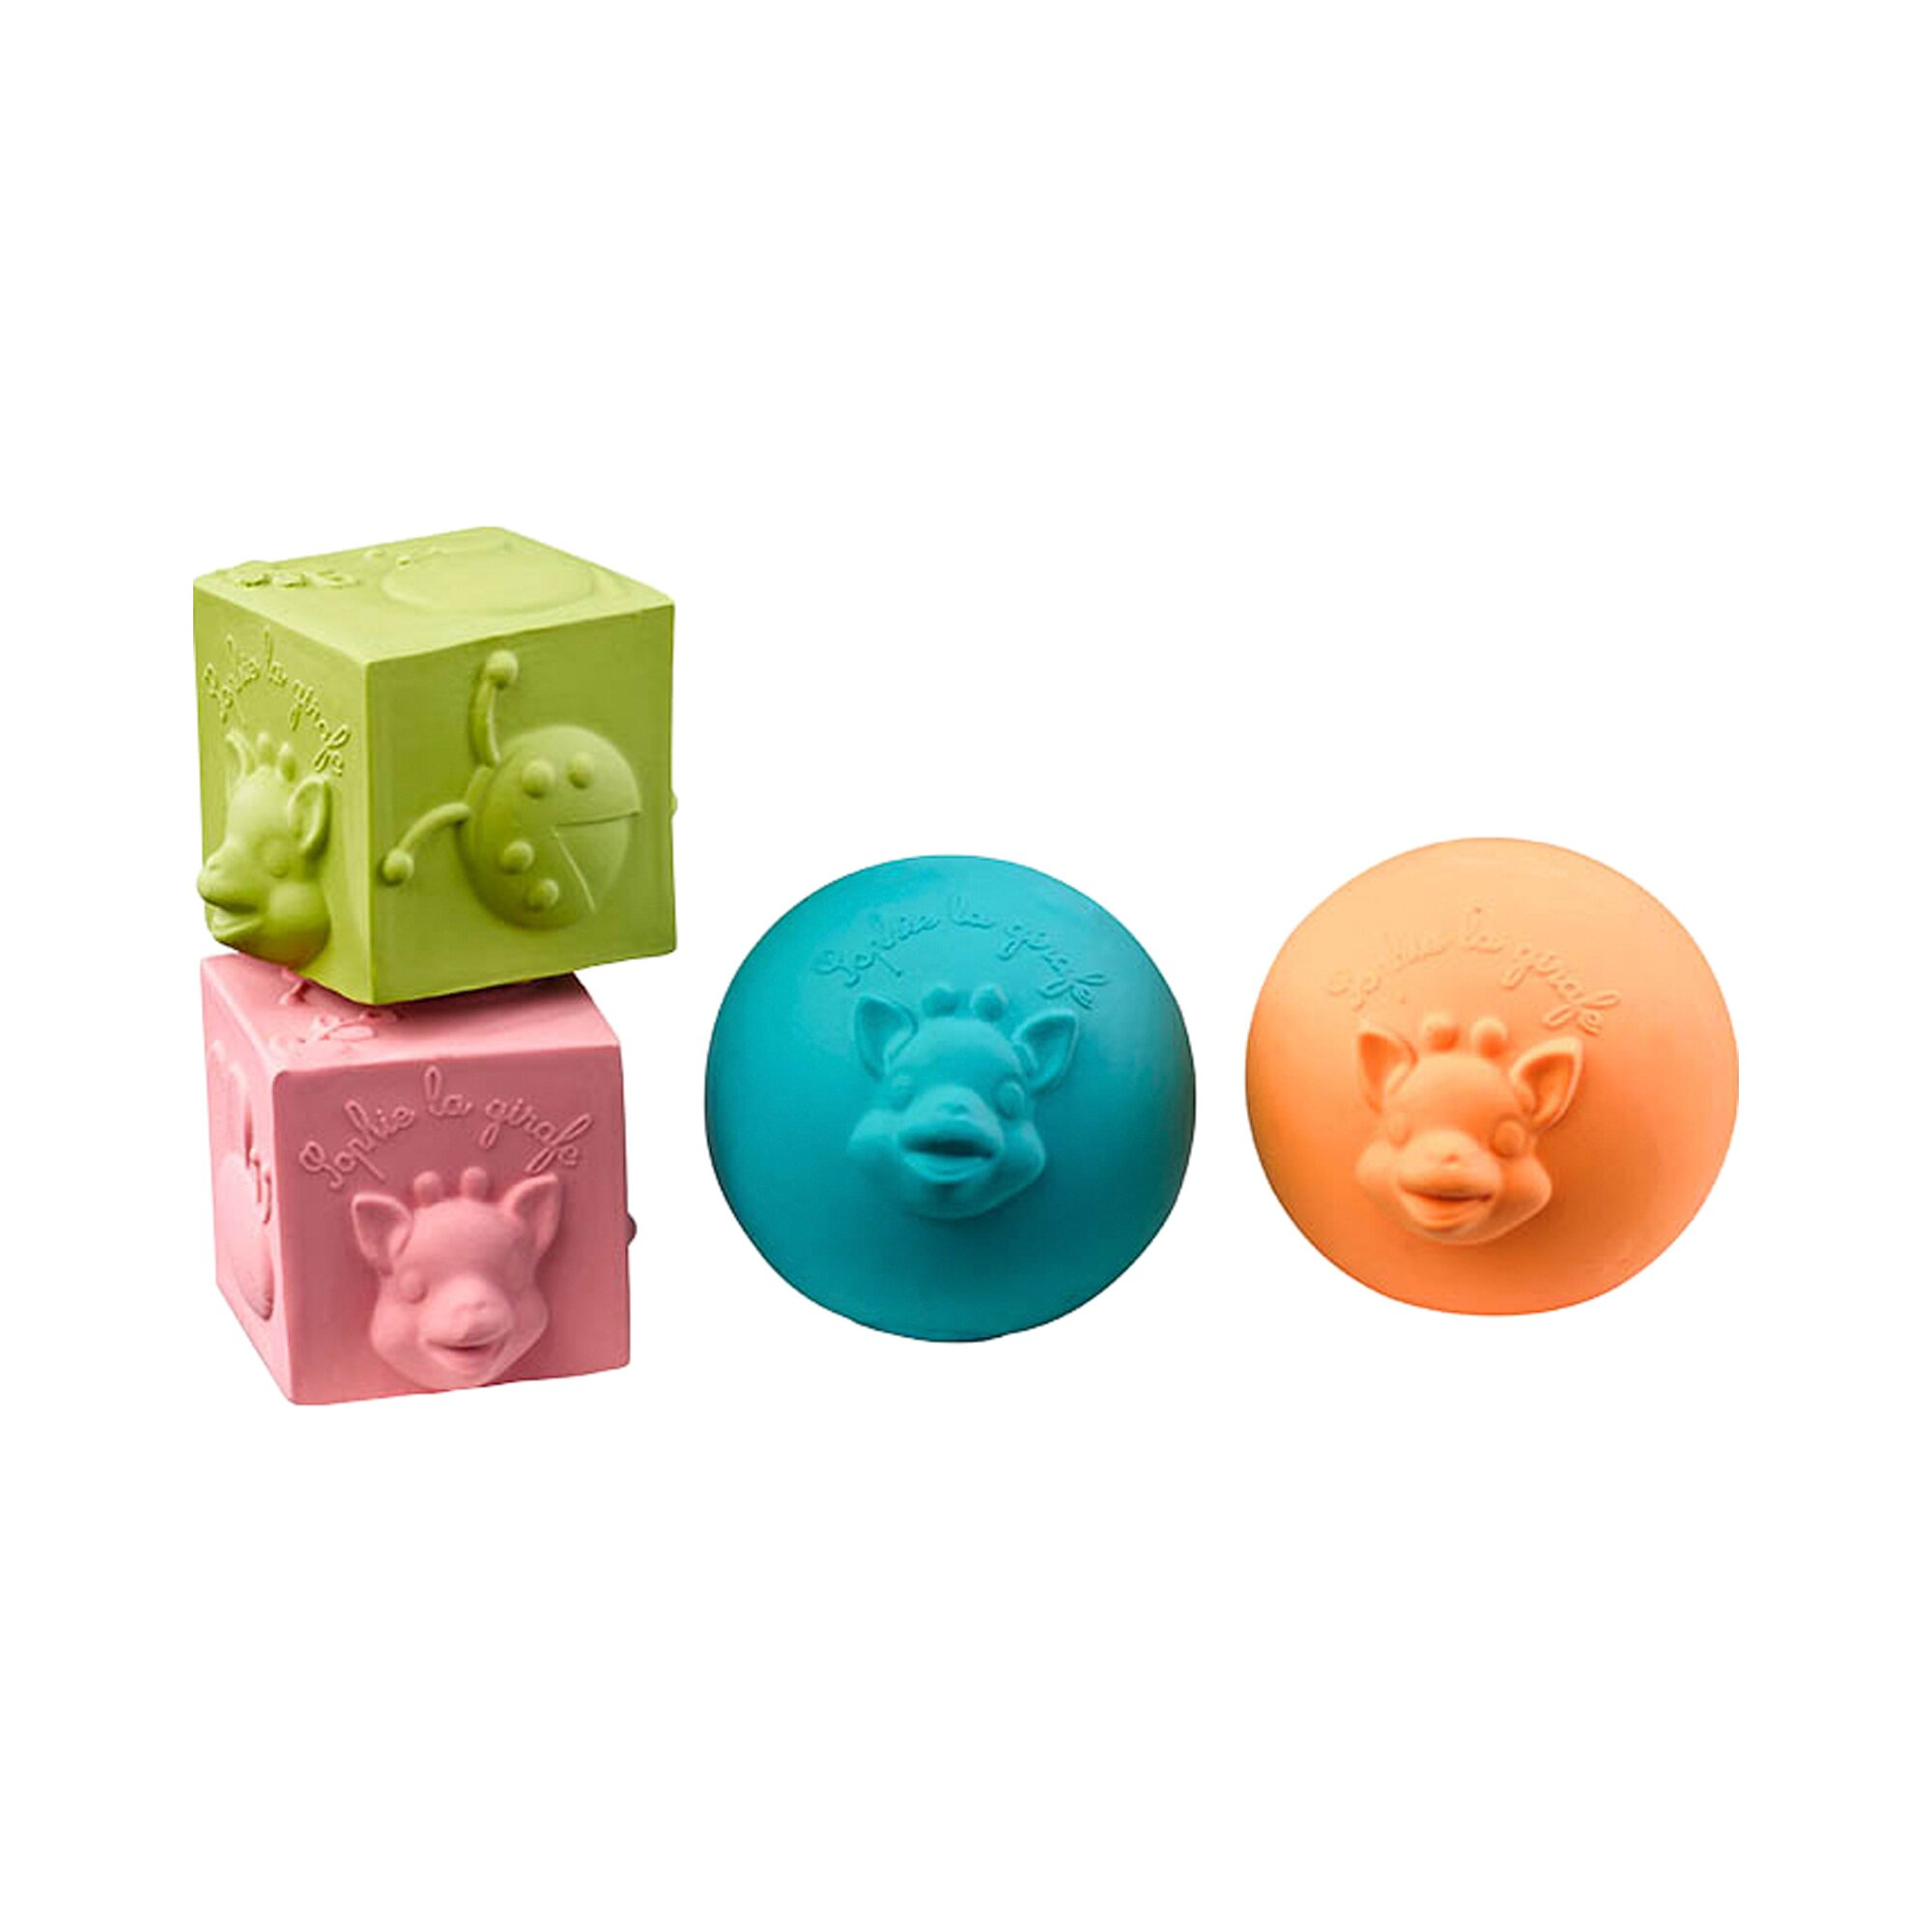 sophie-la-girafe-geschenk-set-2-balle-2-wurfel-so-pure